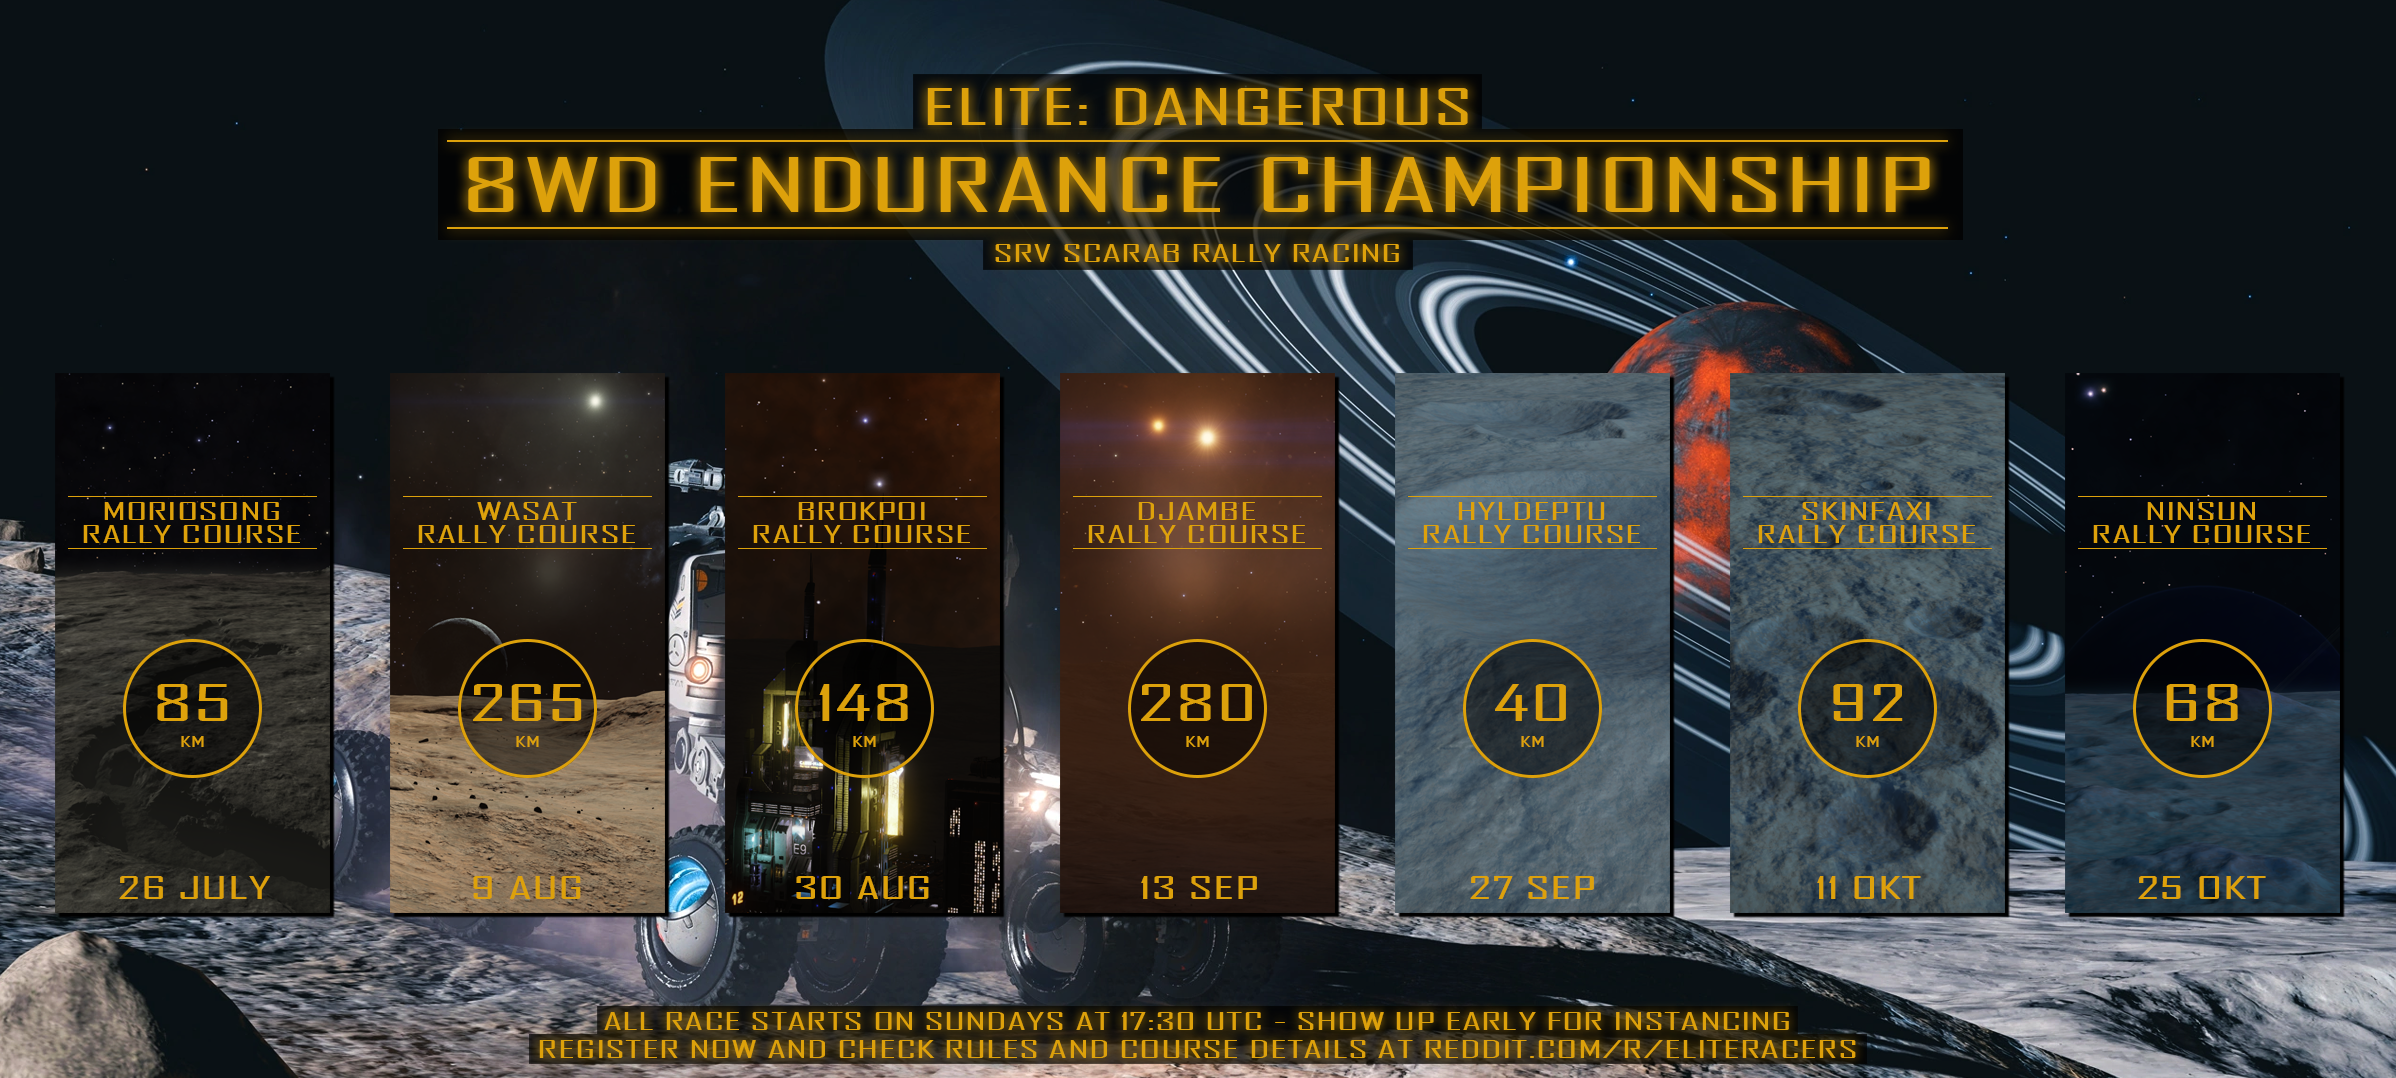 8WD_Endurance_Championship_Poster.png